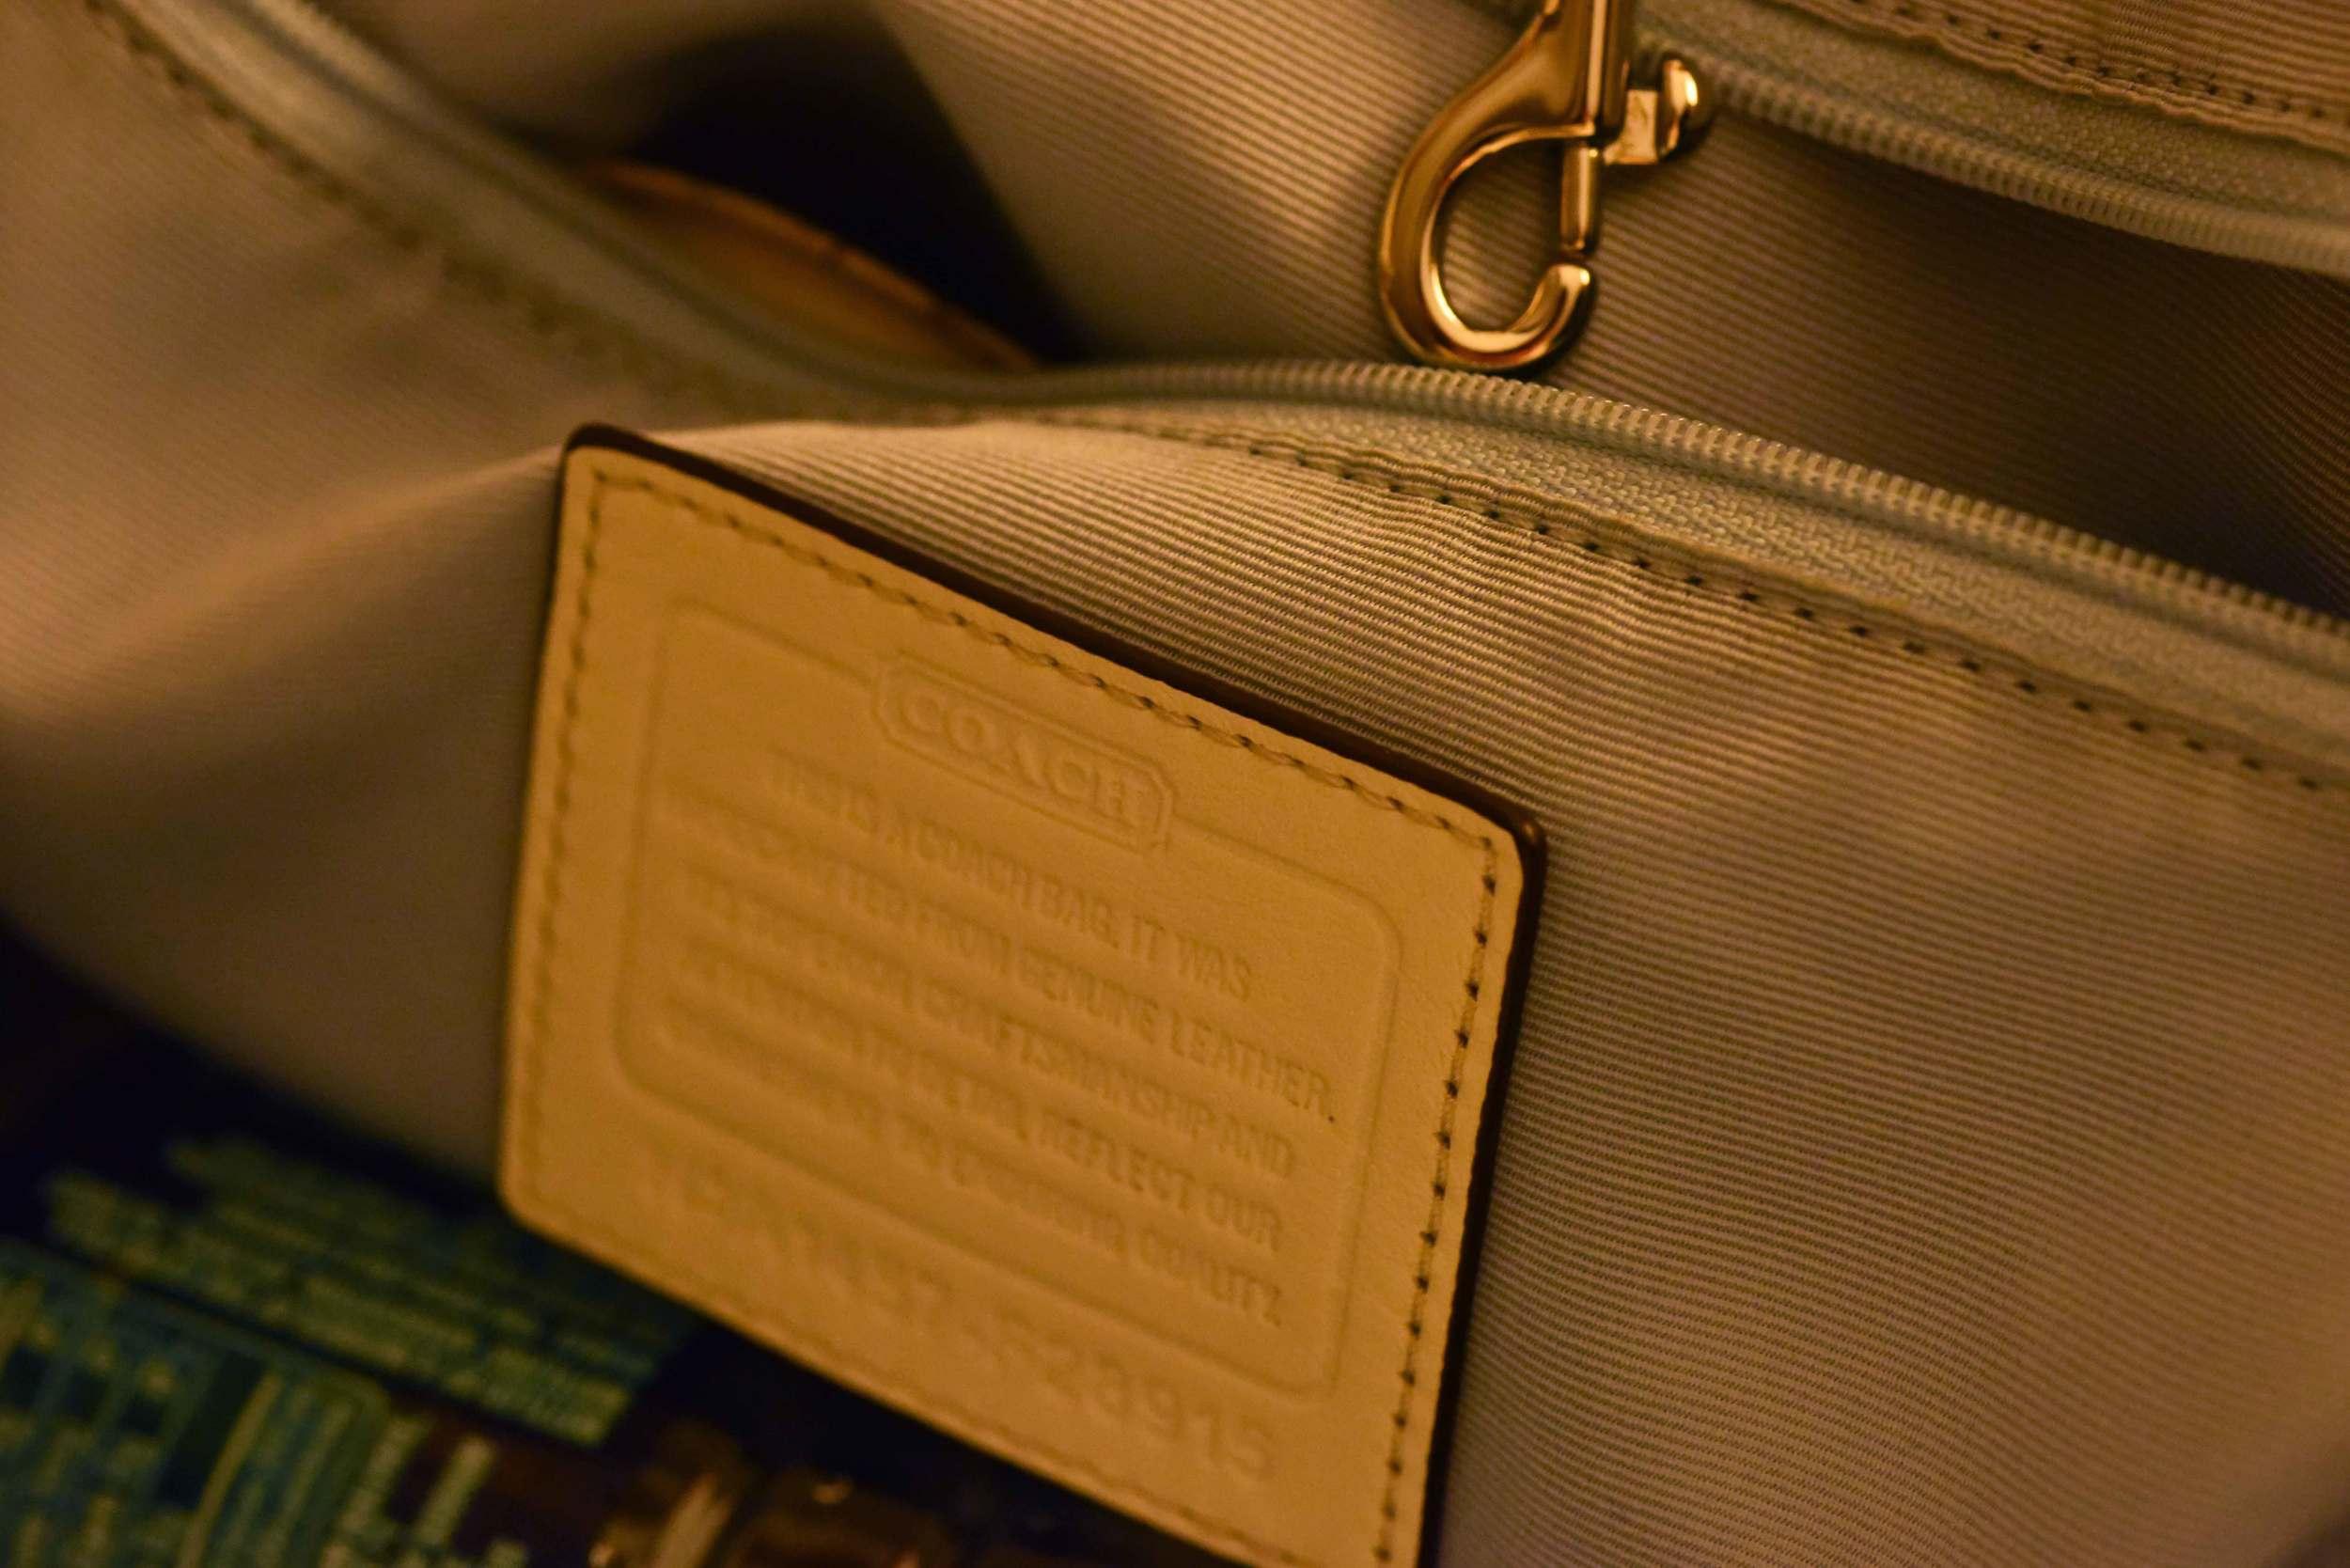 Great quality Coach bag! image©gunjanvirk